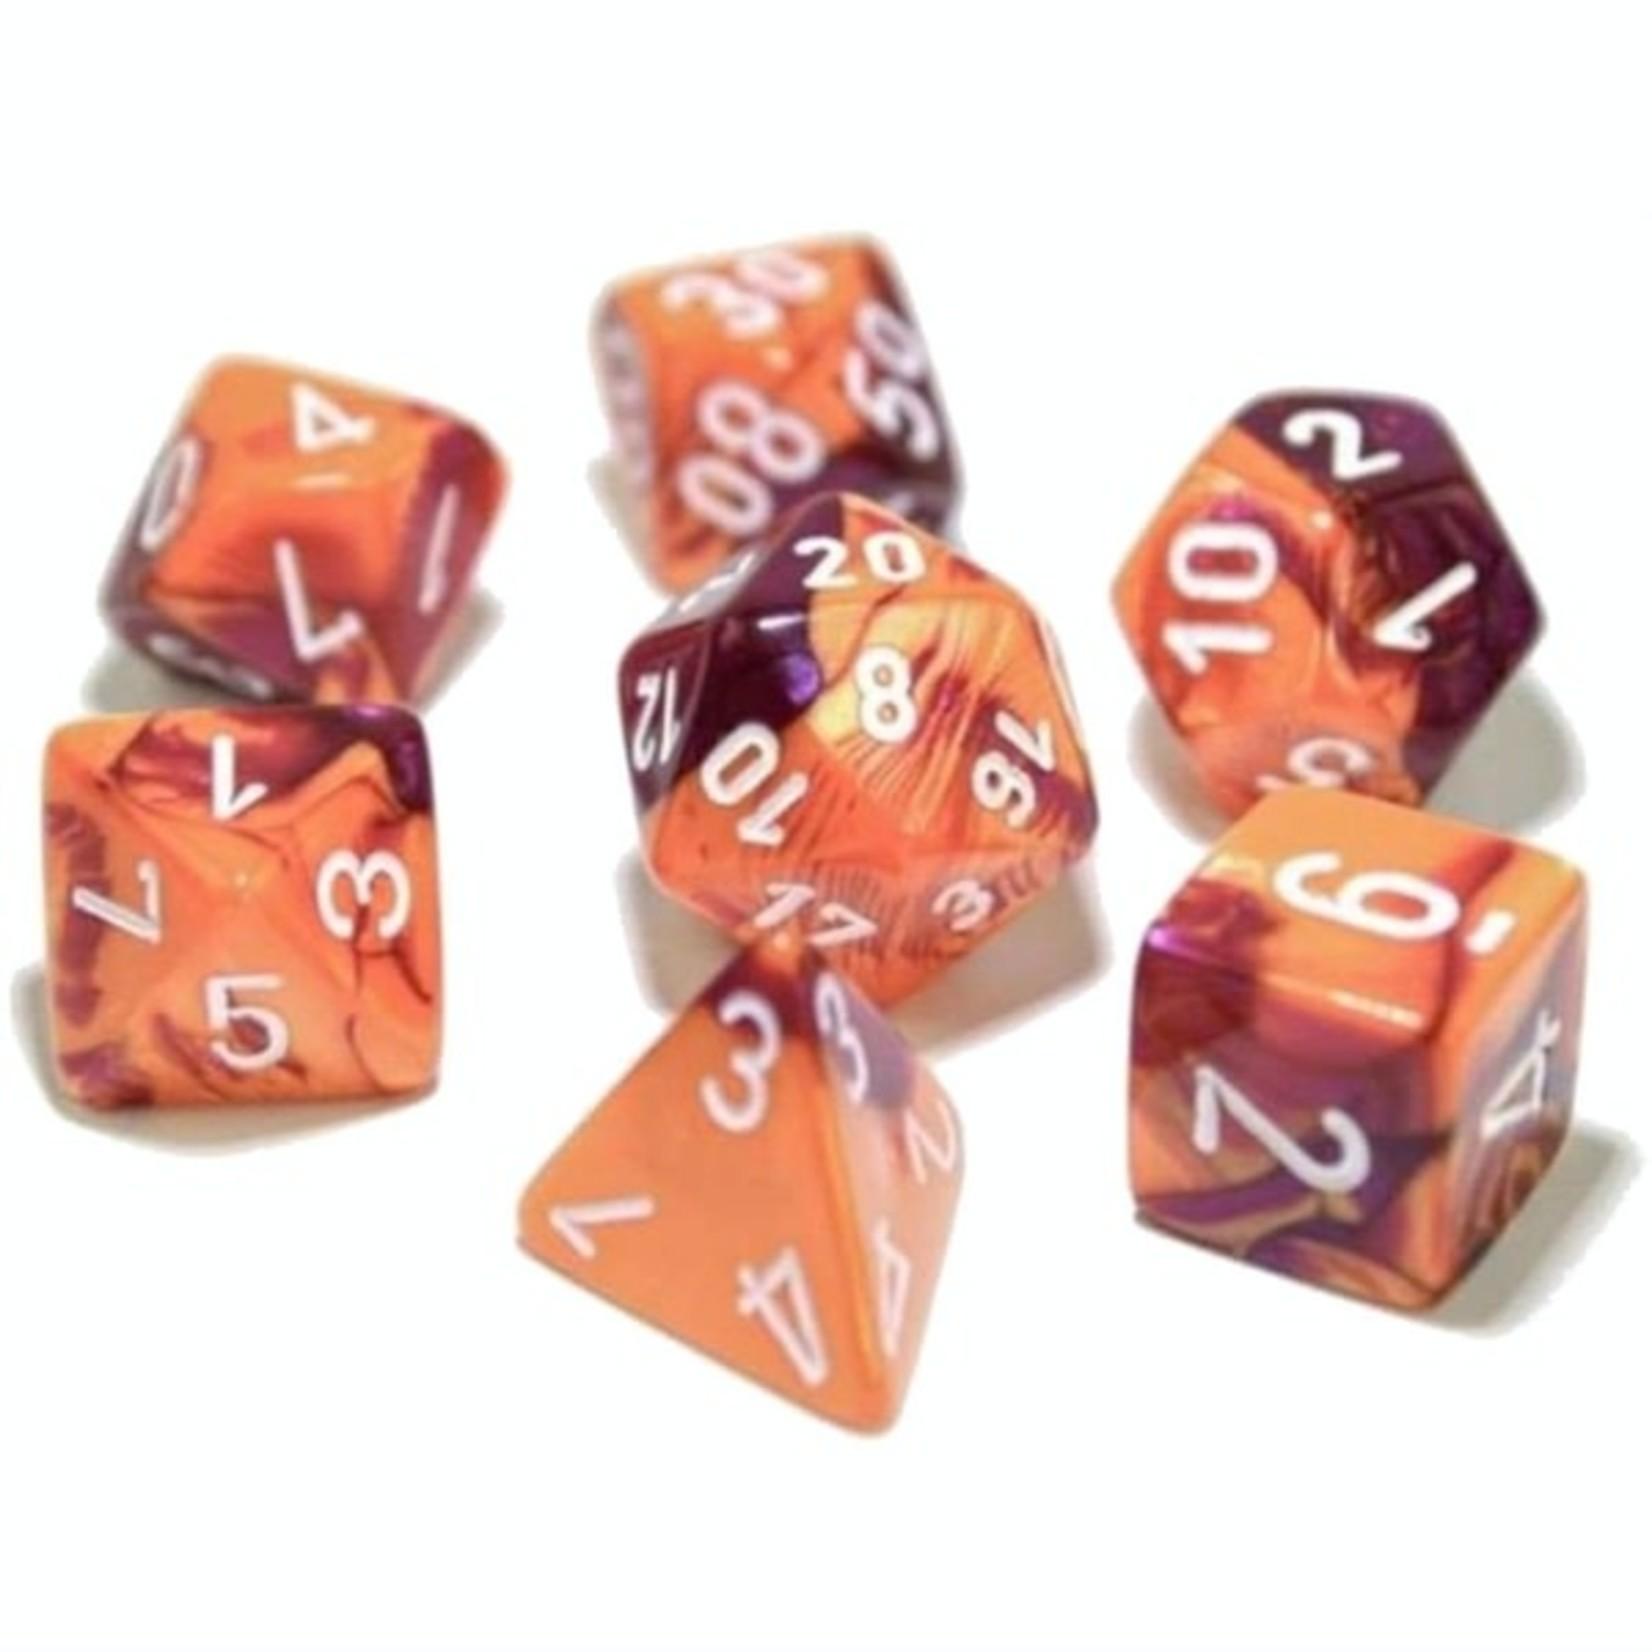 Chessex Gemini Polyhedral Orange-Purple/white 7-Die Set